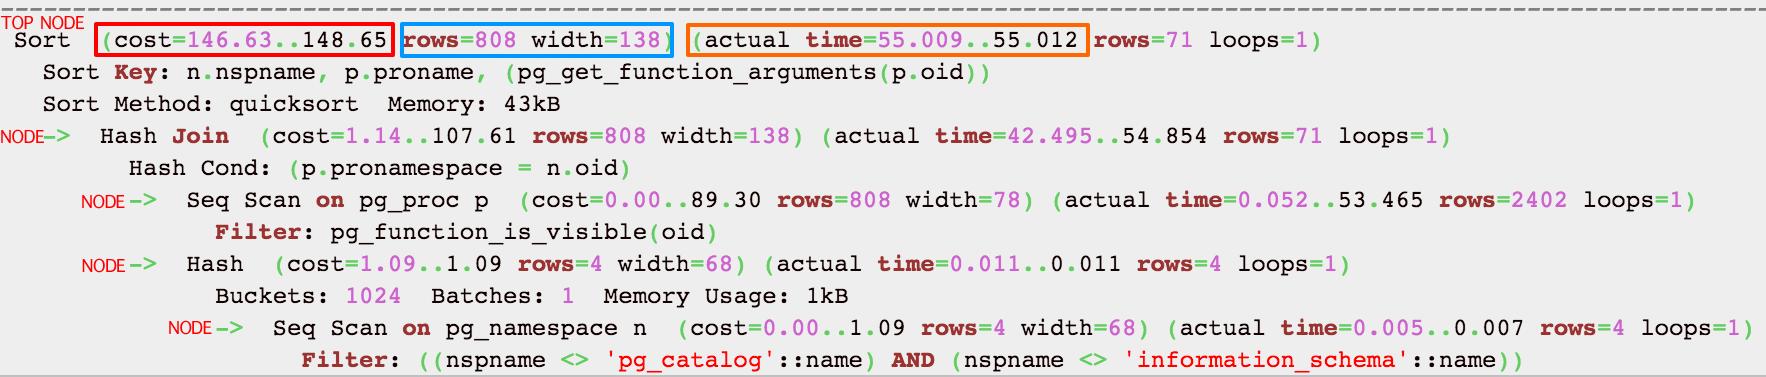 Performance Tuning Queries in PostgreSQL | Geeky Tidbits